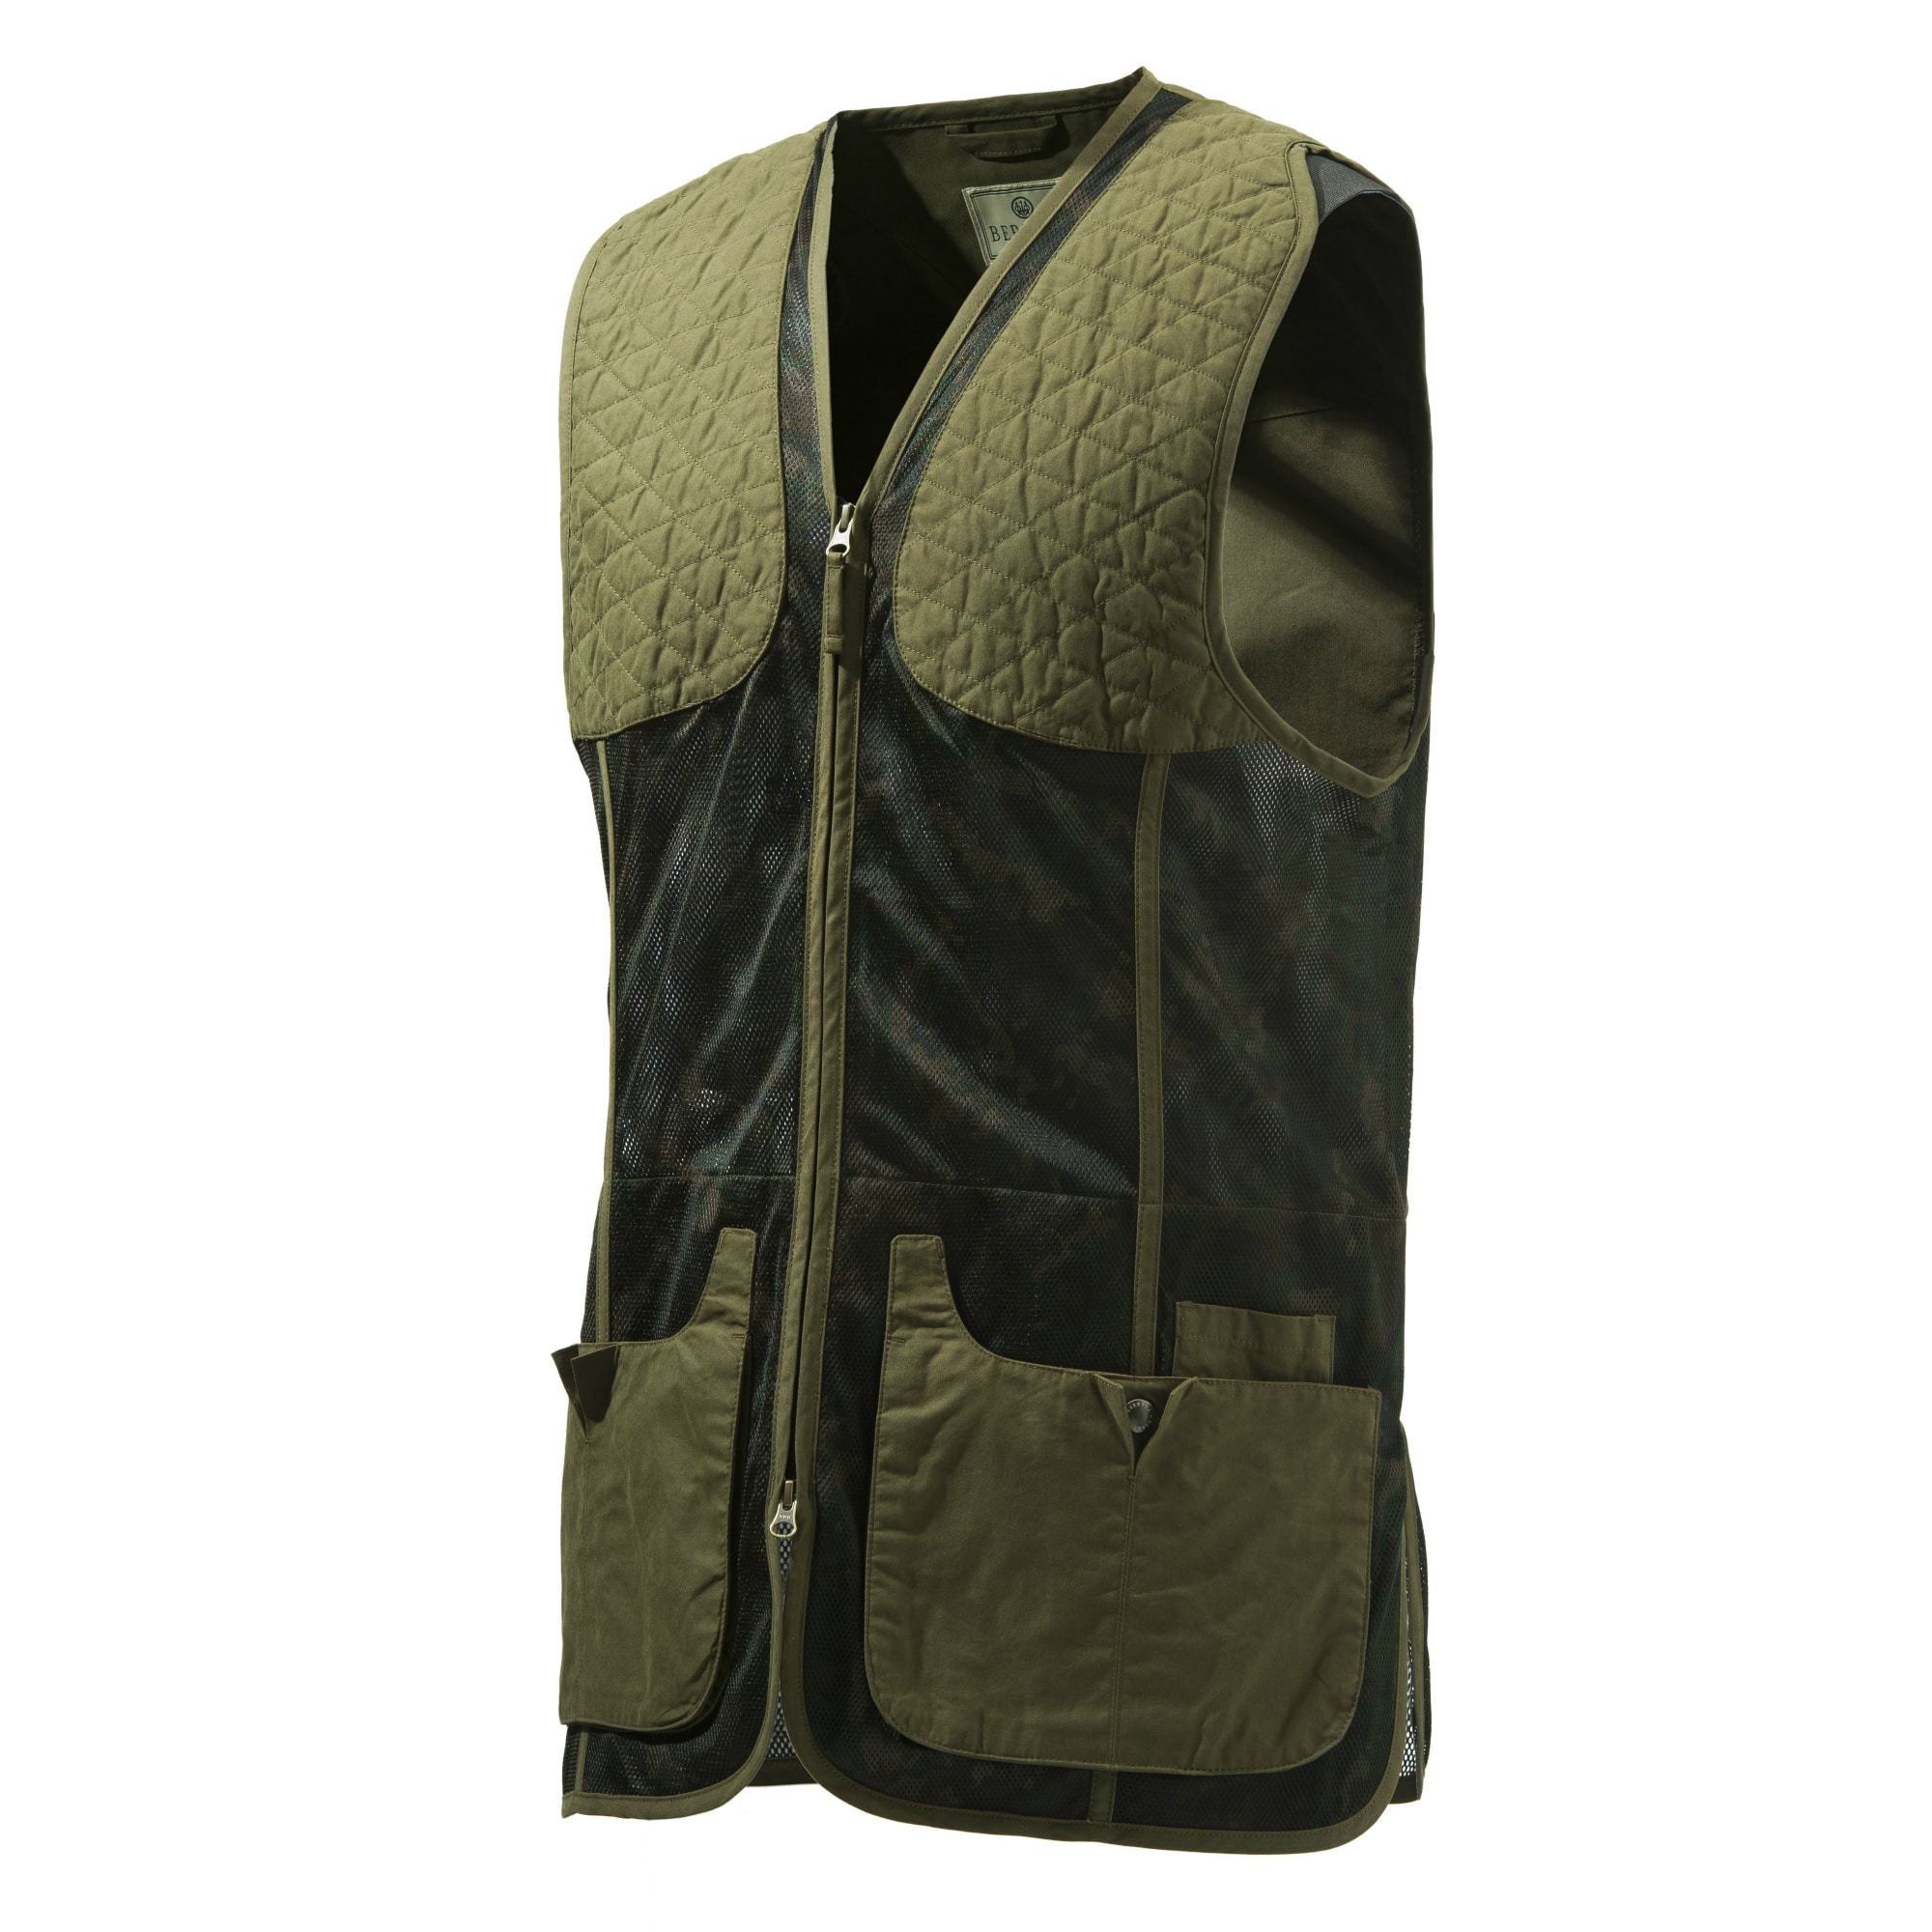 Beretta Urban Camo Mesh Clay Shooting Skeet Vest